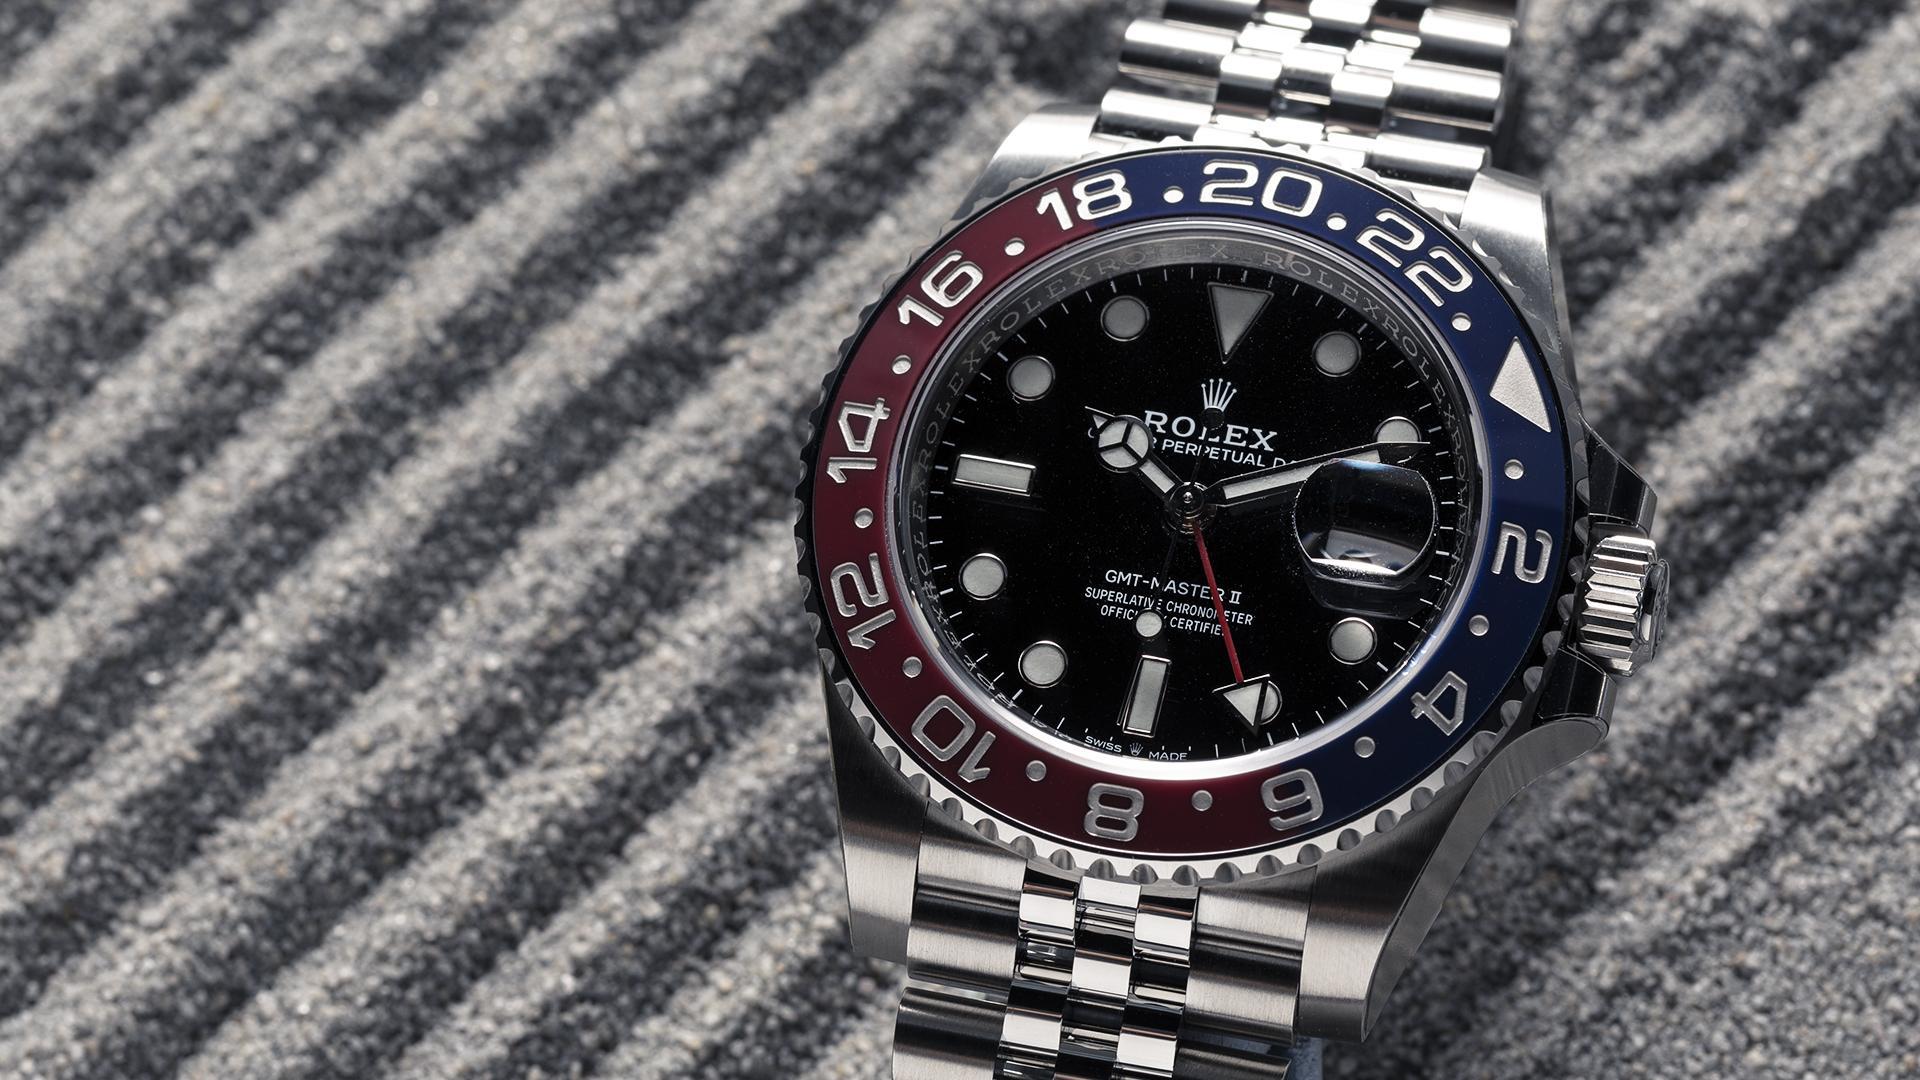 Rolex GMT-Master II Ref. 126710 BLRO 'Pepsi Bezel'